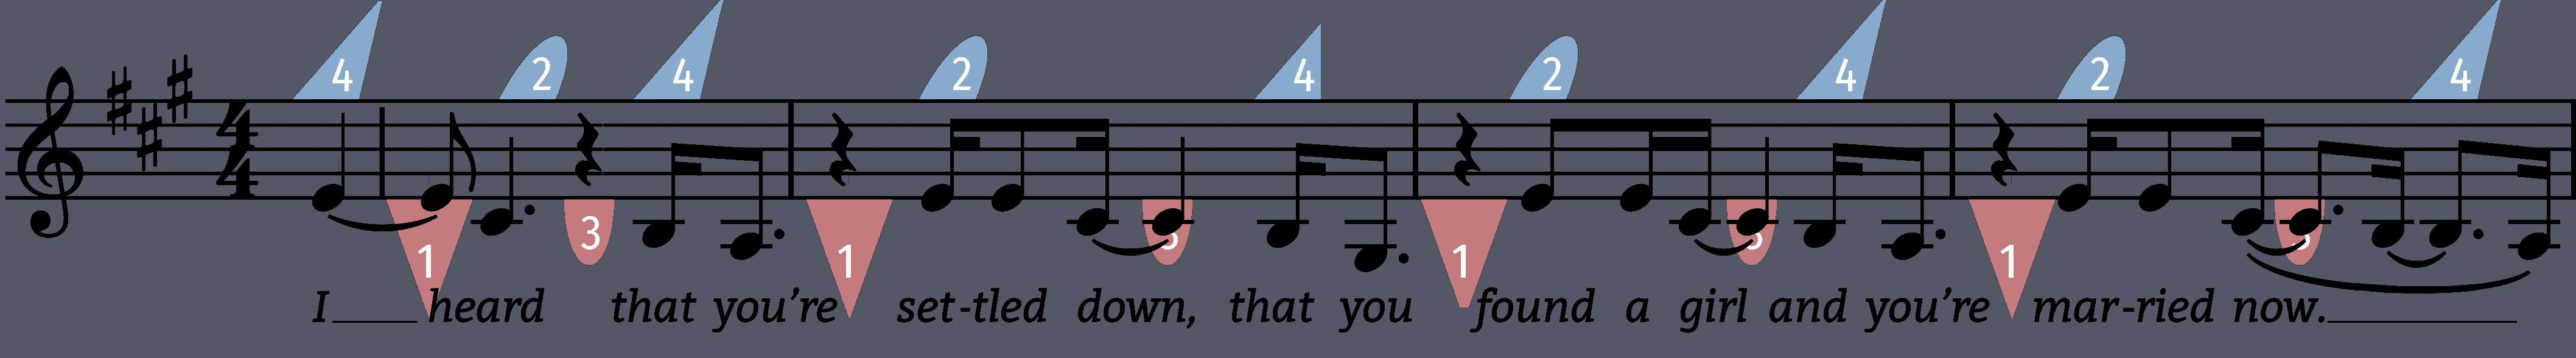 analysis of someone like you